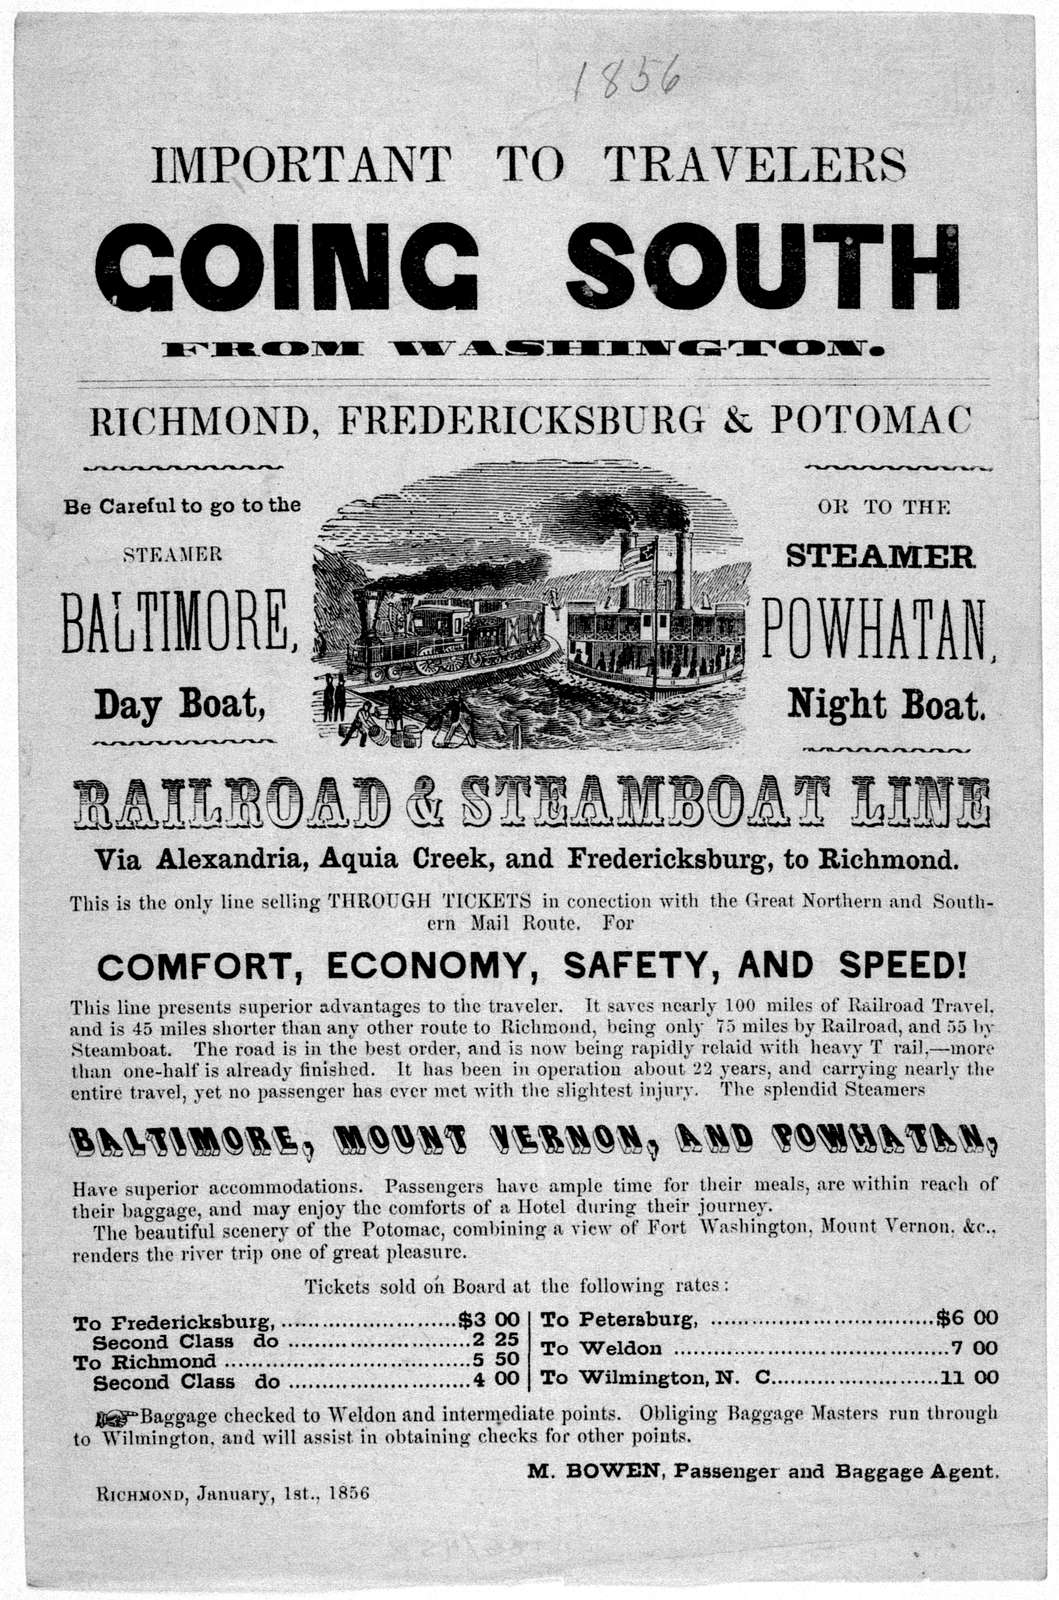 Important to travelers going South from Washington. Richmond, Fredericksburg & Potomac. ... Railroad & steamboat line via Alexandria Aquia Creek and Fredericksburg to Richmond ... Richmond, January 1st, 1856.